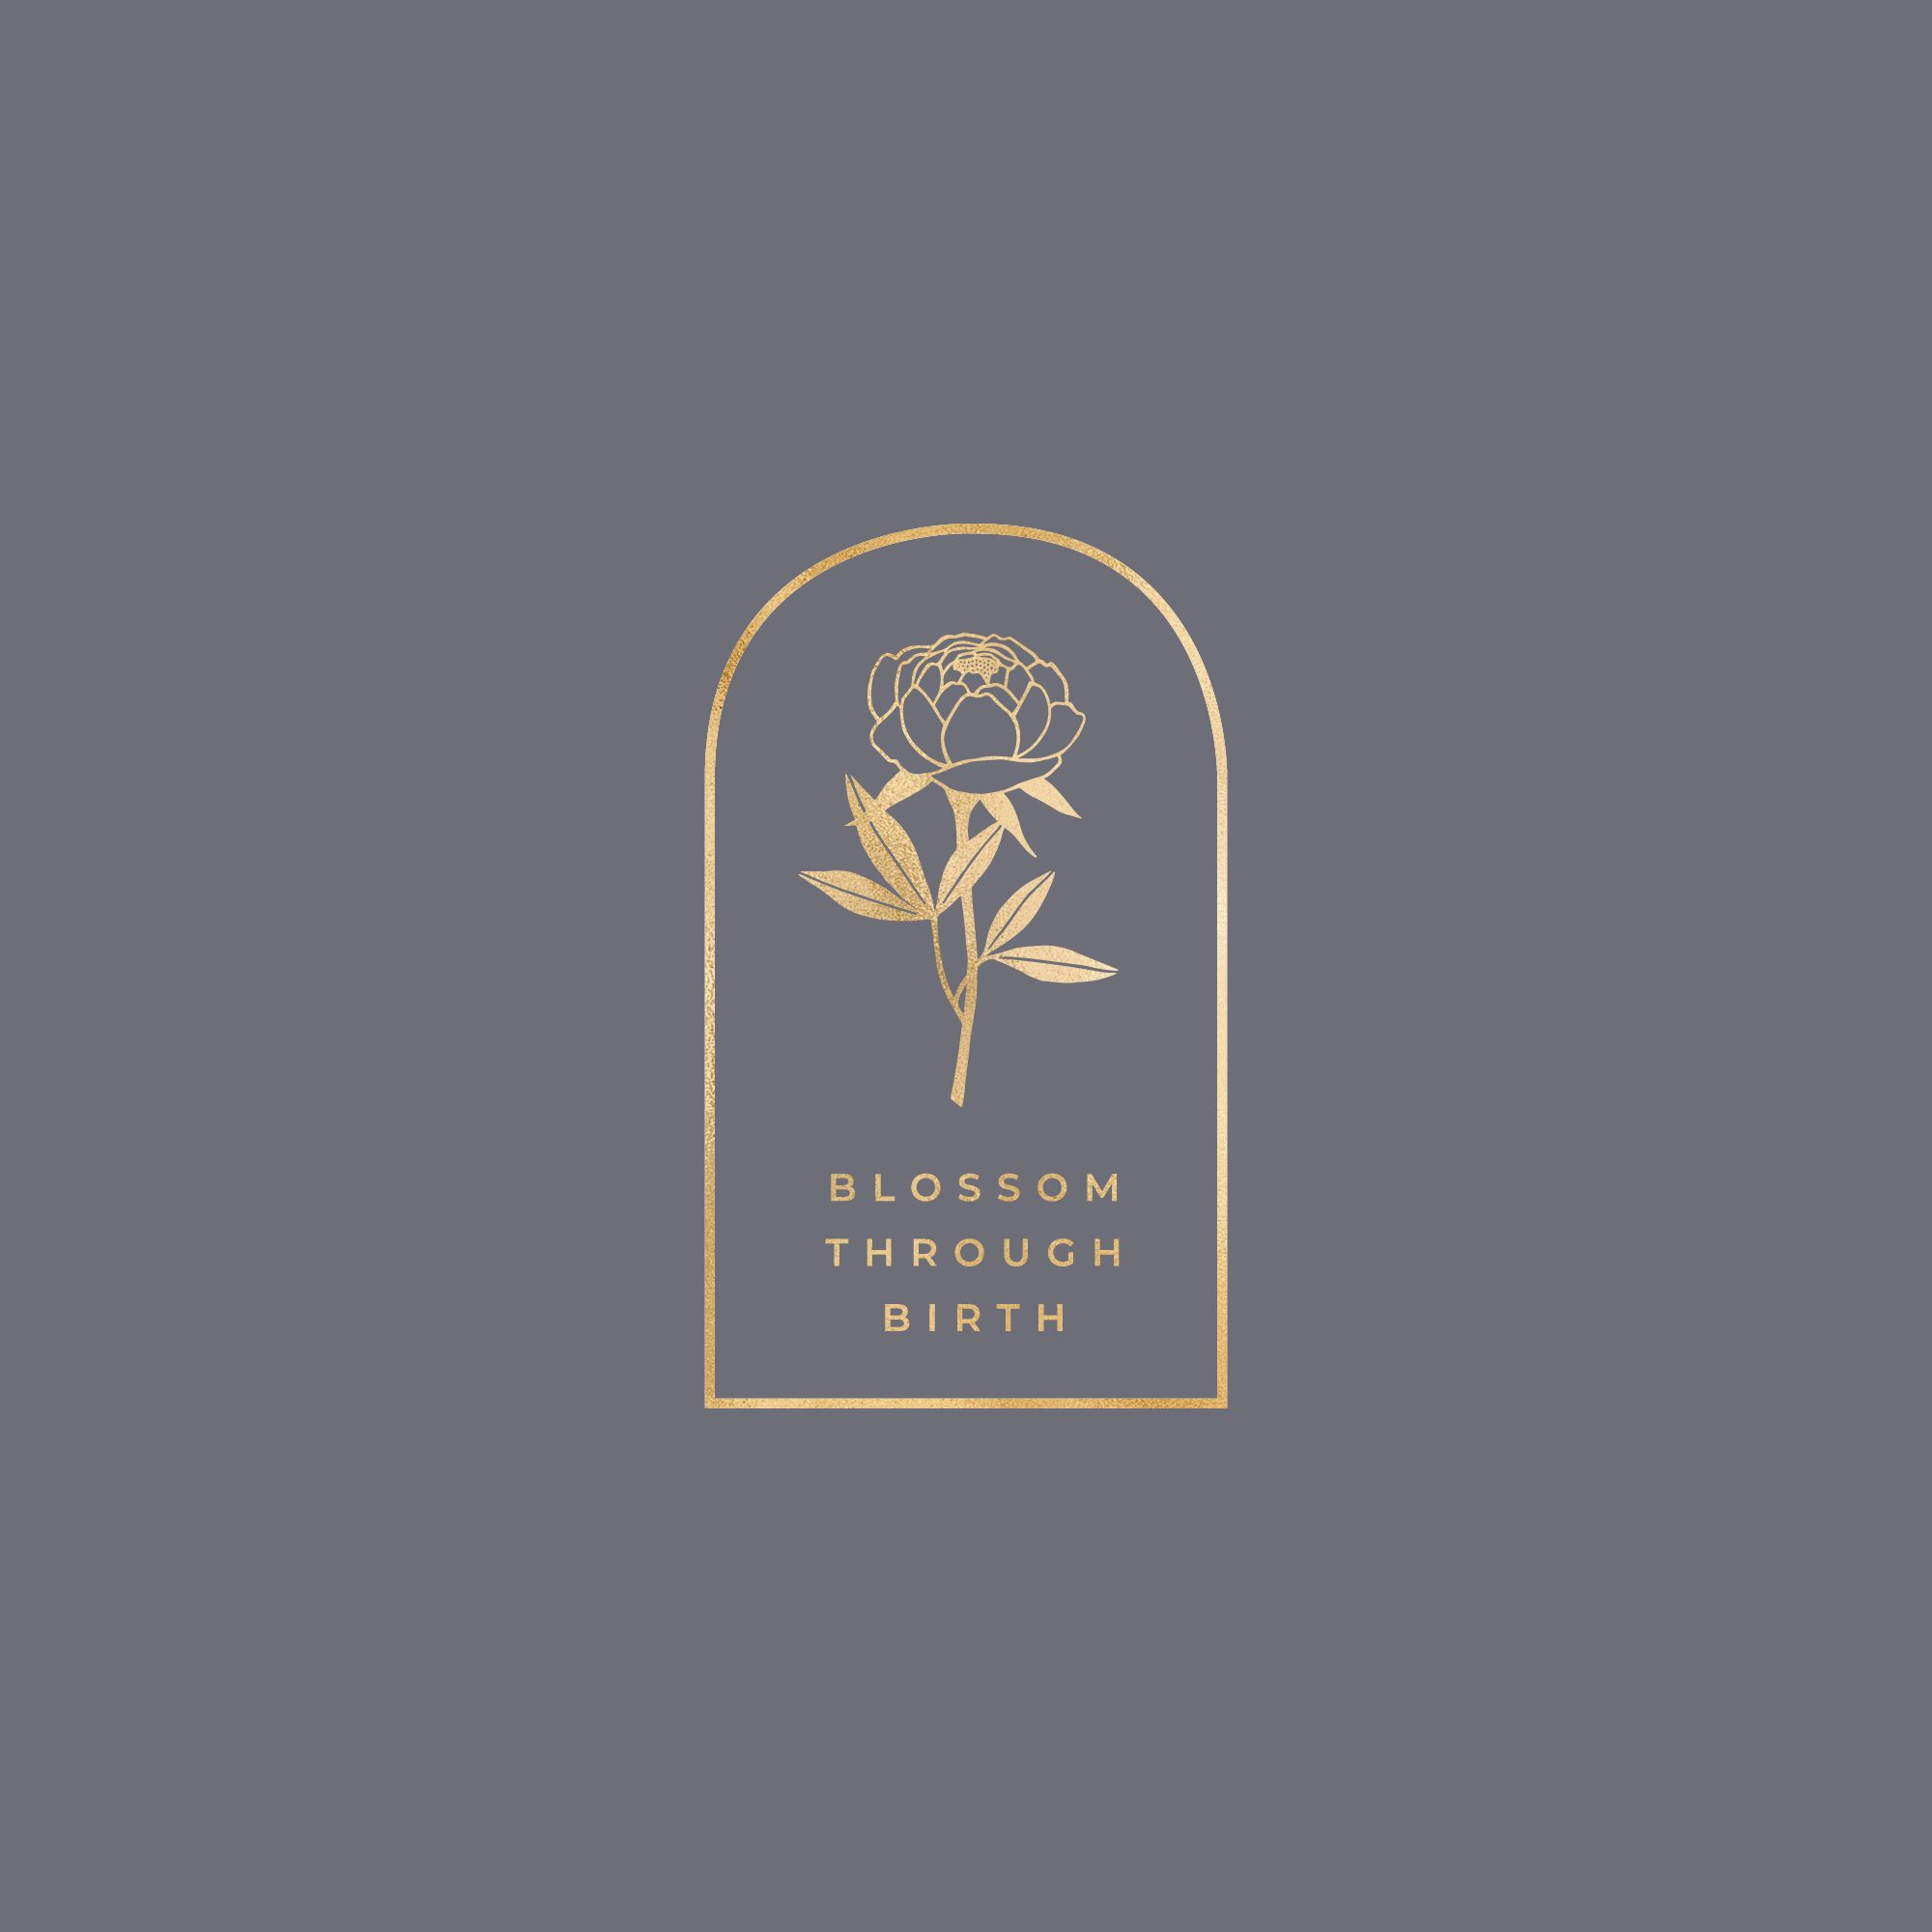 Blossom Through Birth Branding Element For Aroma Birth Organics Floral Logo Design Flower Logo Design Candle Logo Design